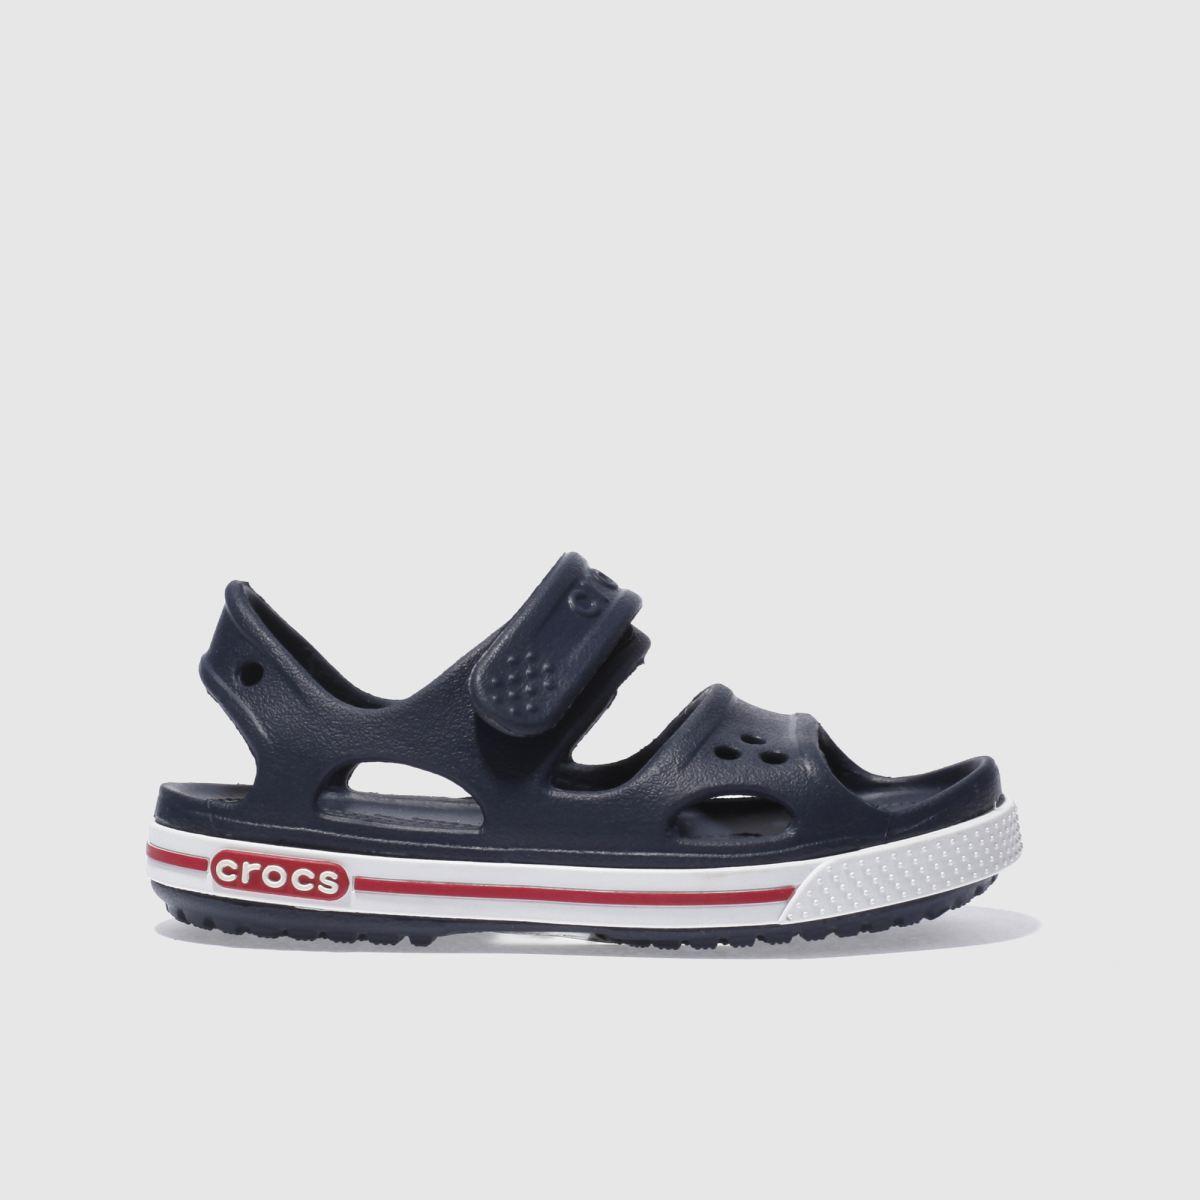 Crocs Navy & White Crocband Sandal Sandals Junior